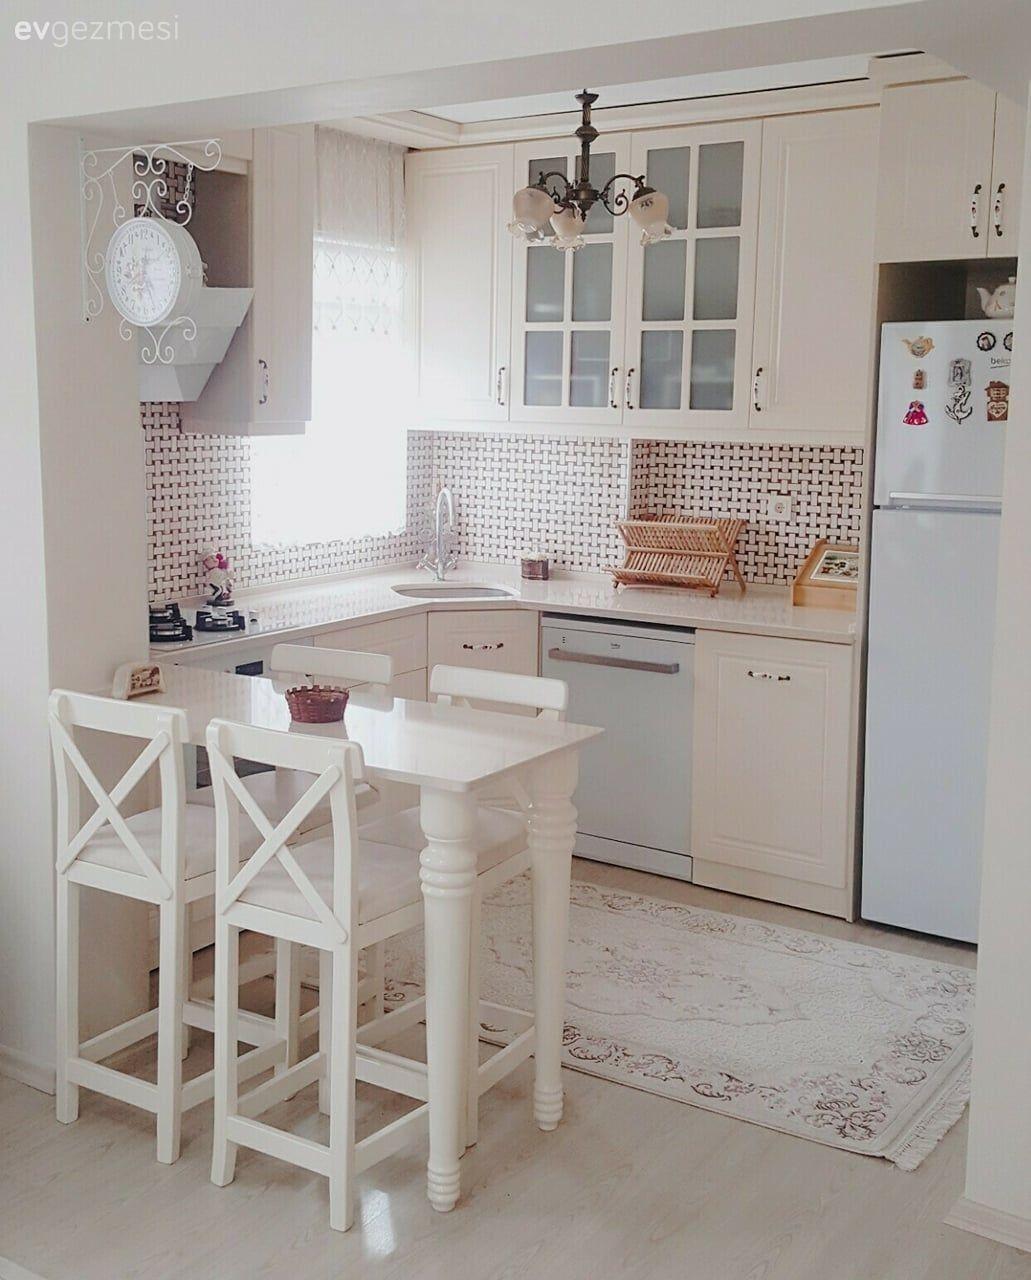 Pin By On Ev Dekorasyon Cerceve Small Kitchen Decor Design Home